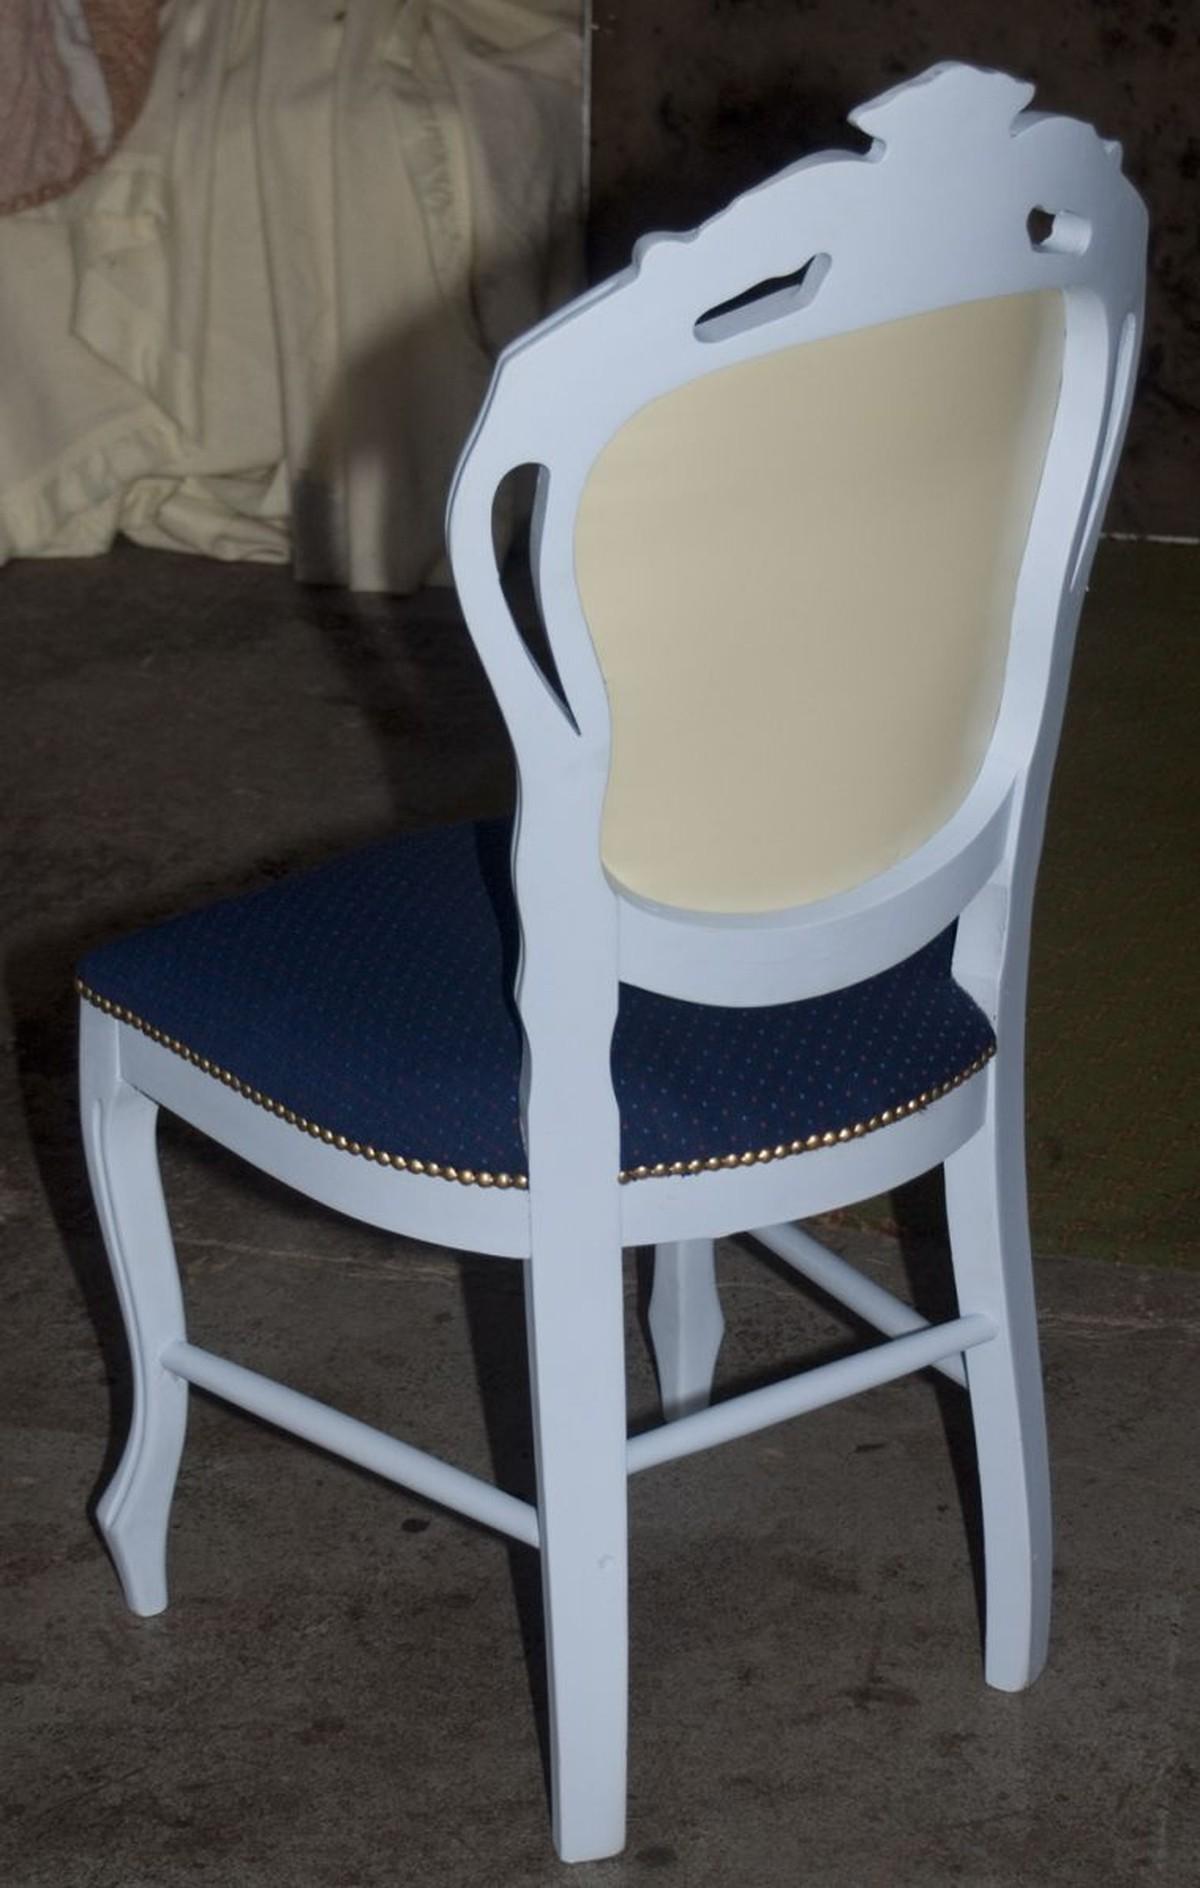 Secondhand Hotel Furniture Banquet Chair Vintage Sky